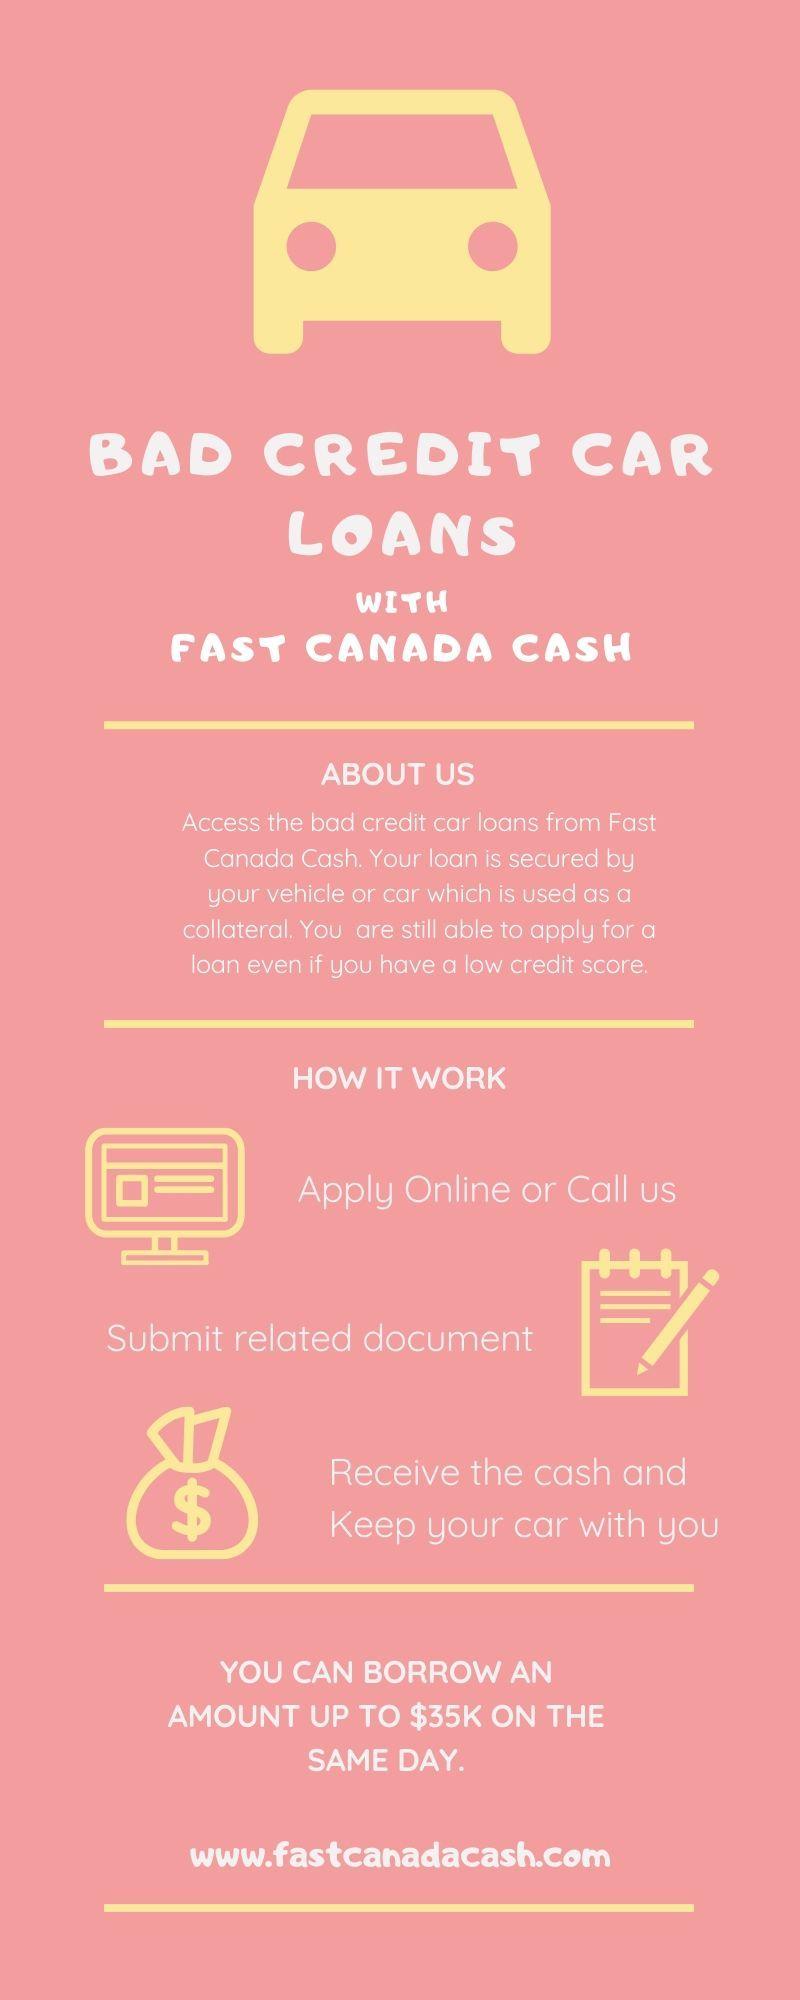 Short Term Bad Credit Car Loans Vancouver in 2020 Bad